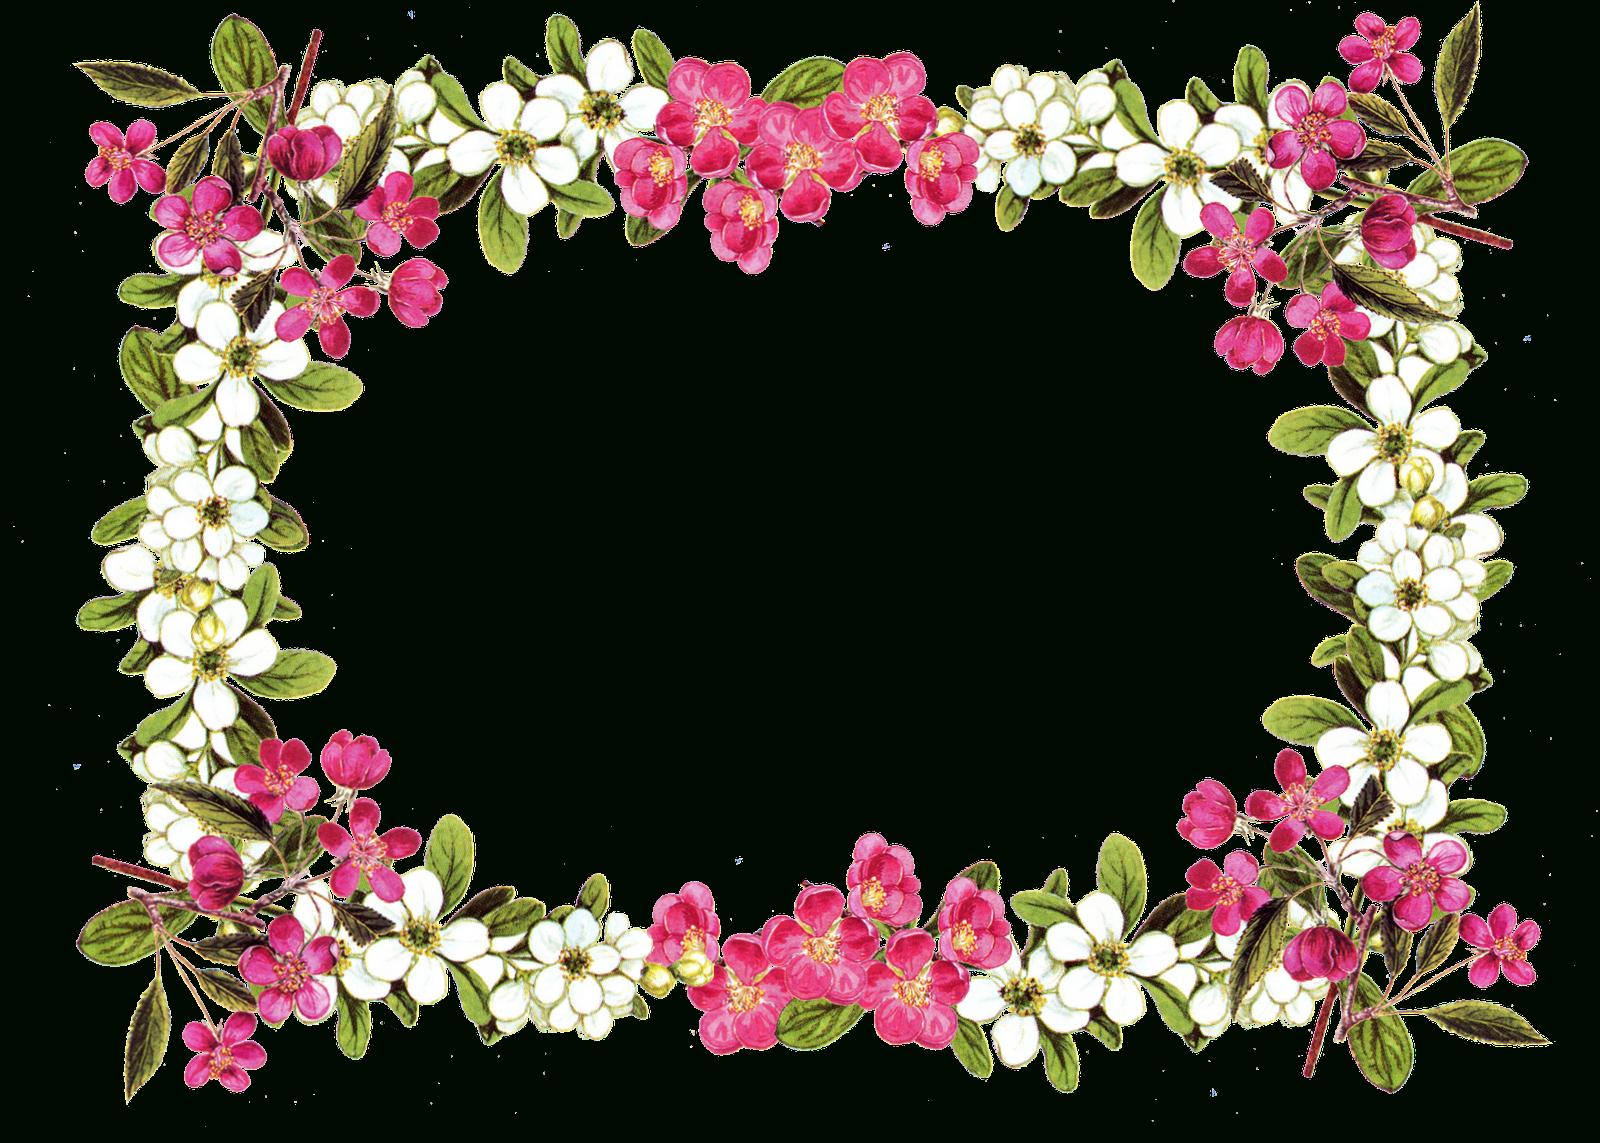 Free Printable Borders Digital Flower Frame Png Free Image - Free Printable Borders